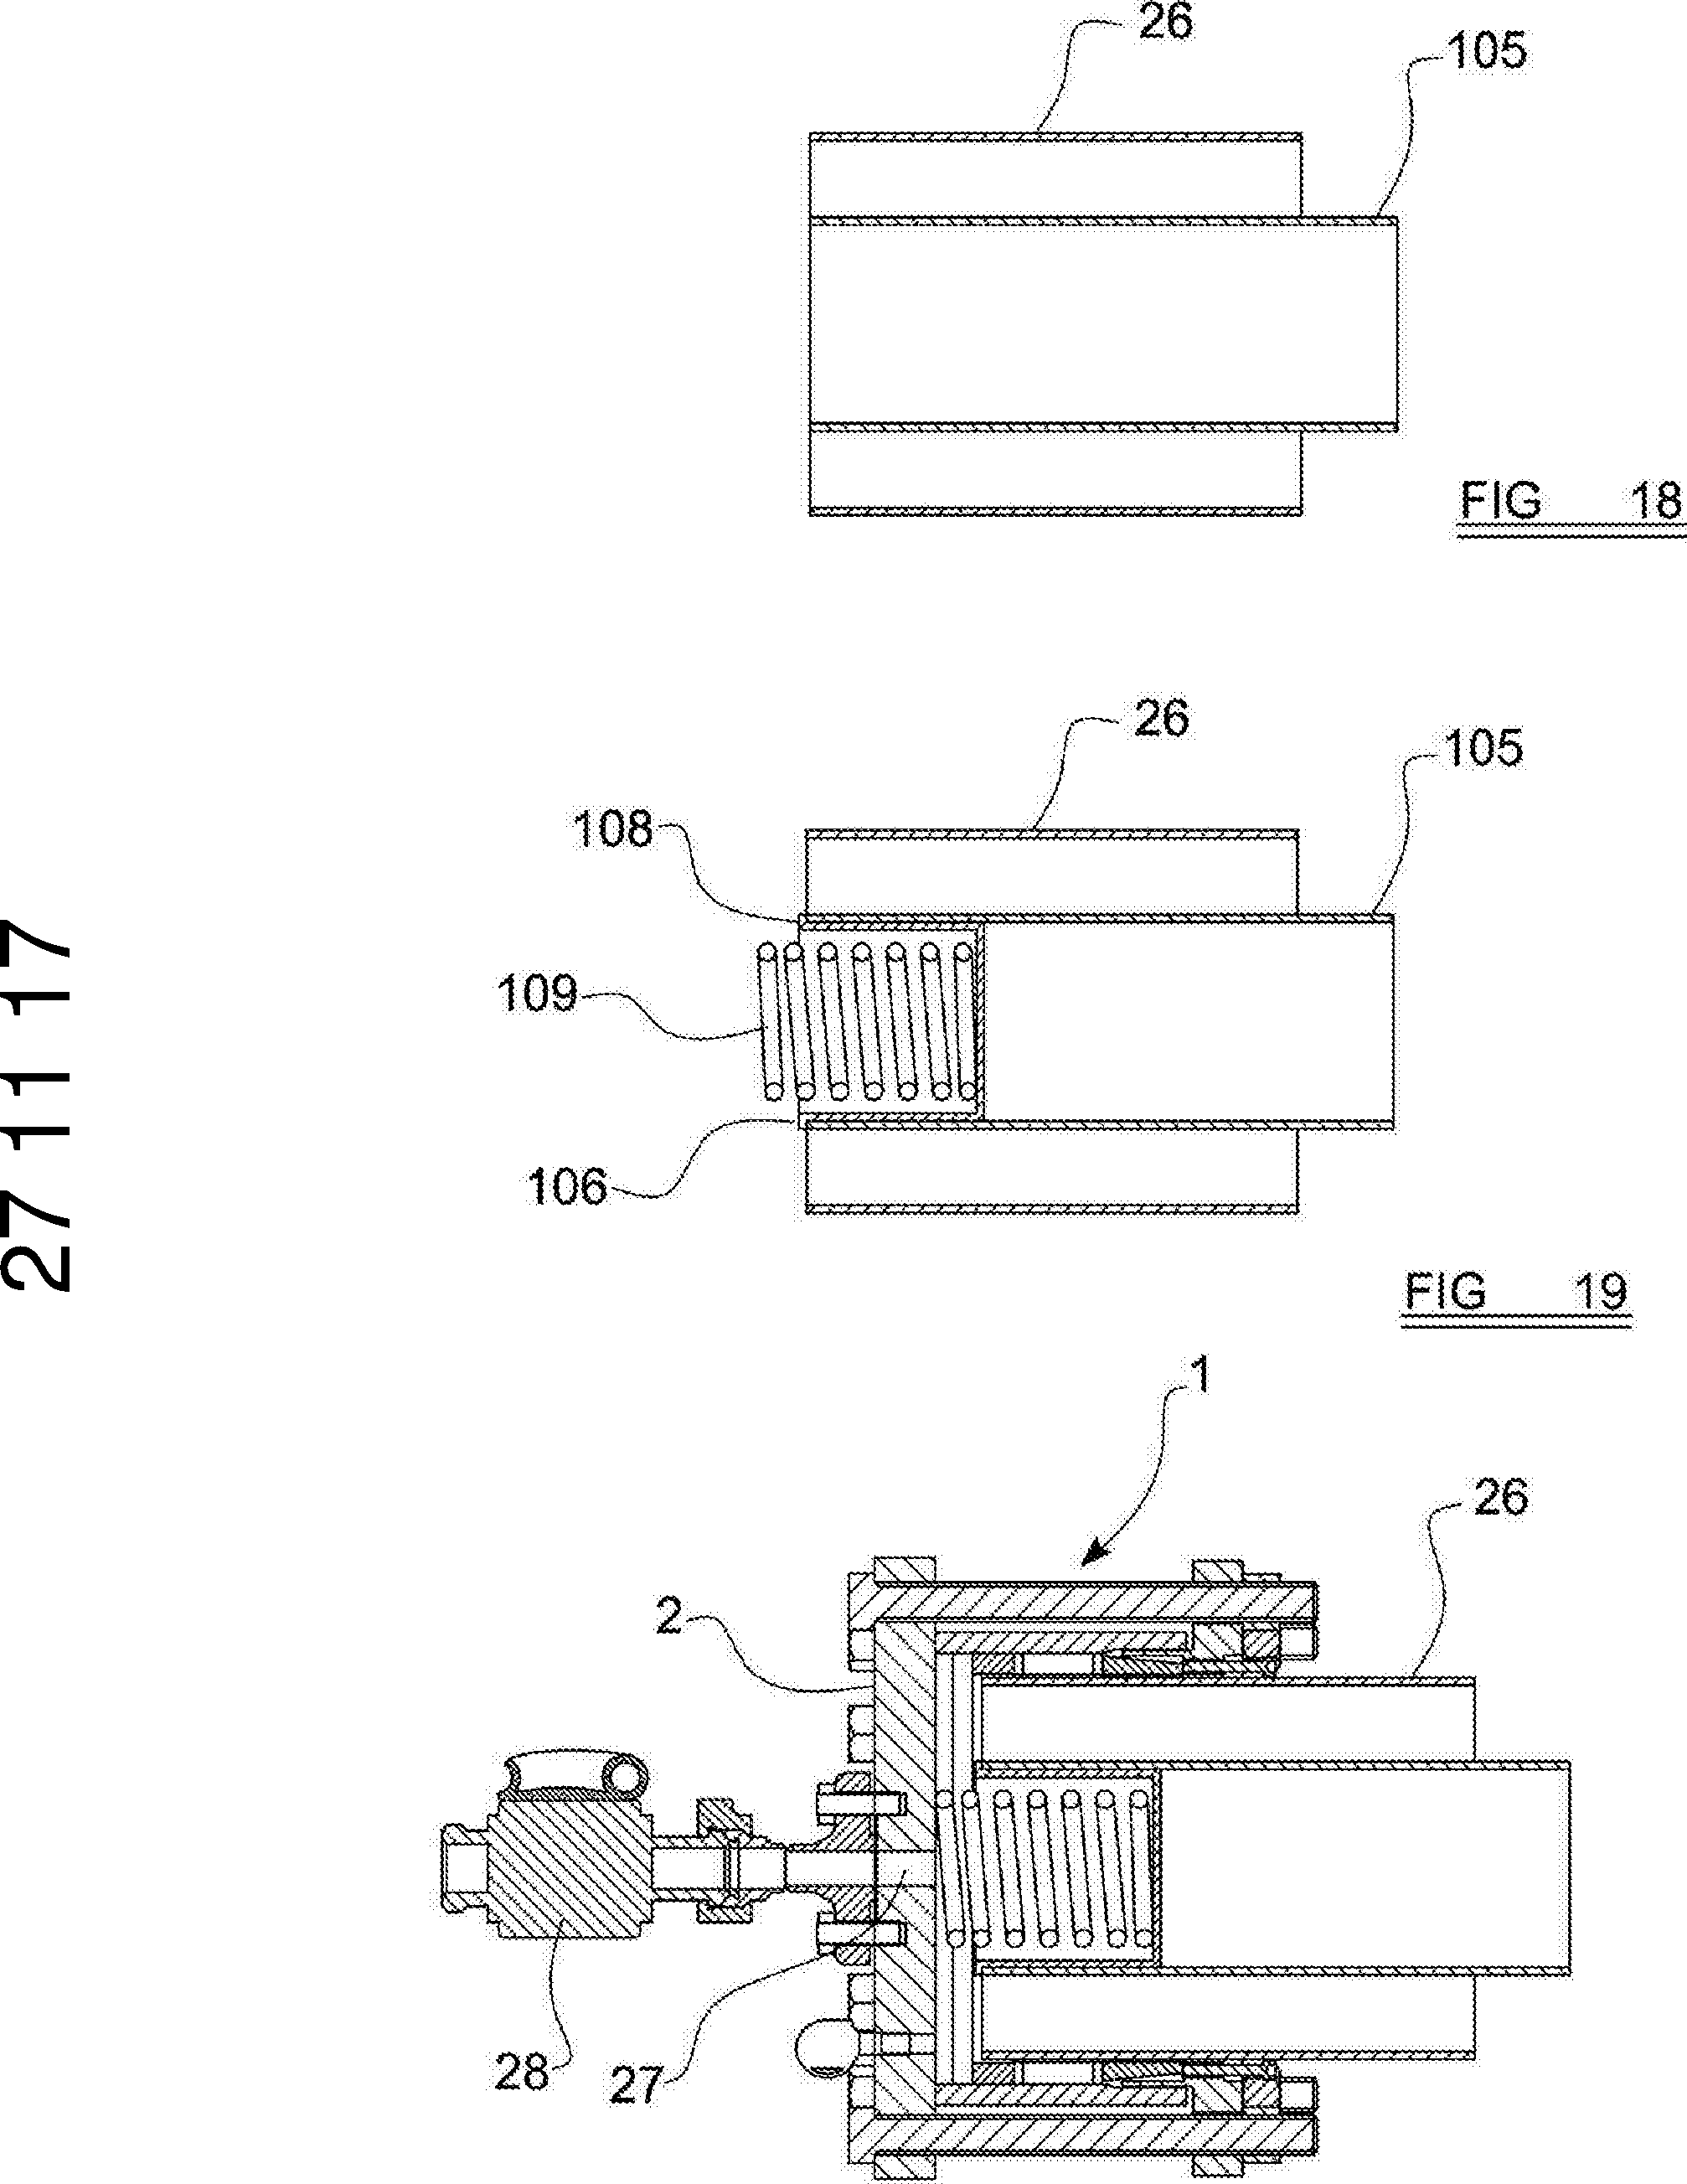 Figure GB2555219A_D0014